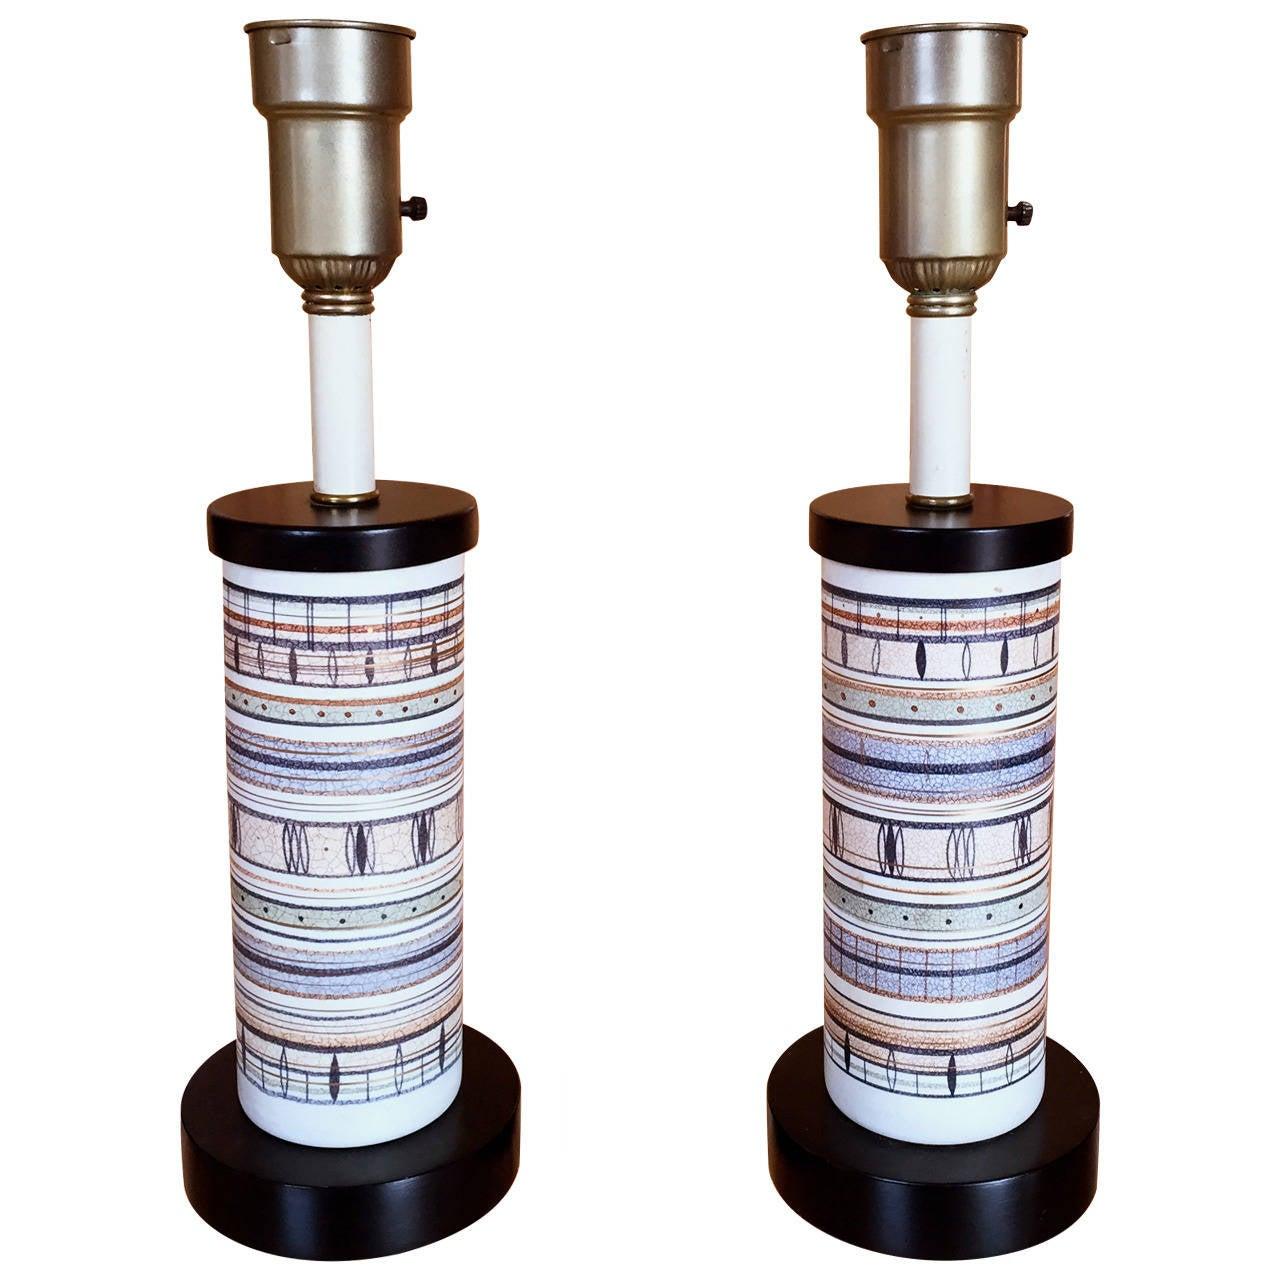 Pair of Sascha Brastoff Pottery Lamps